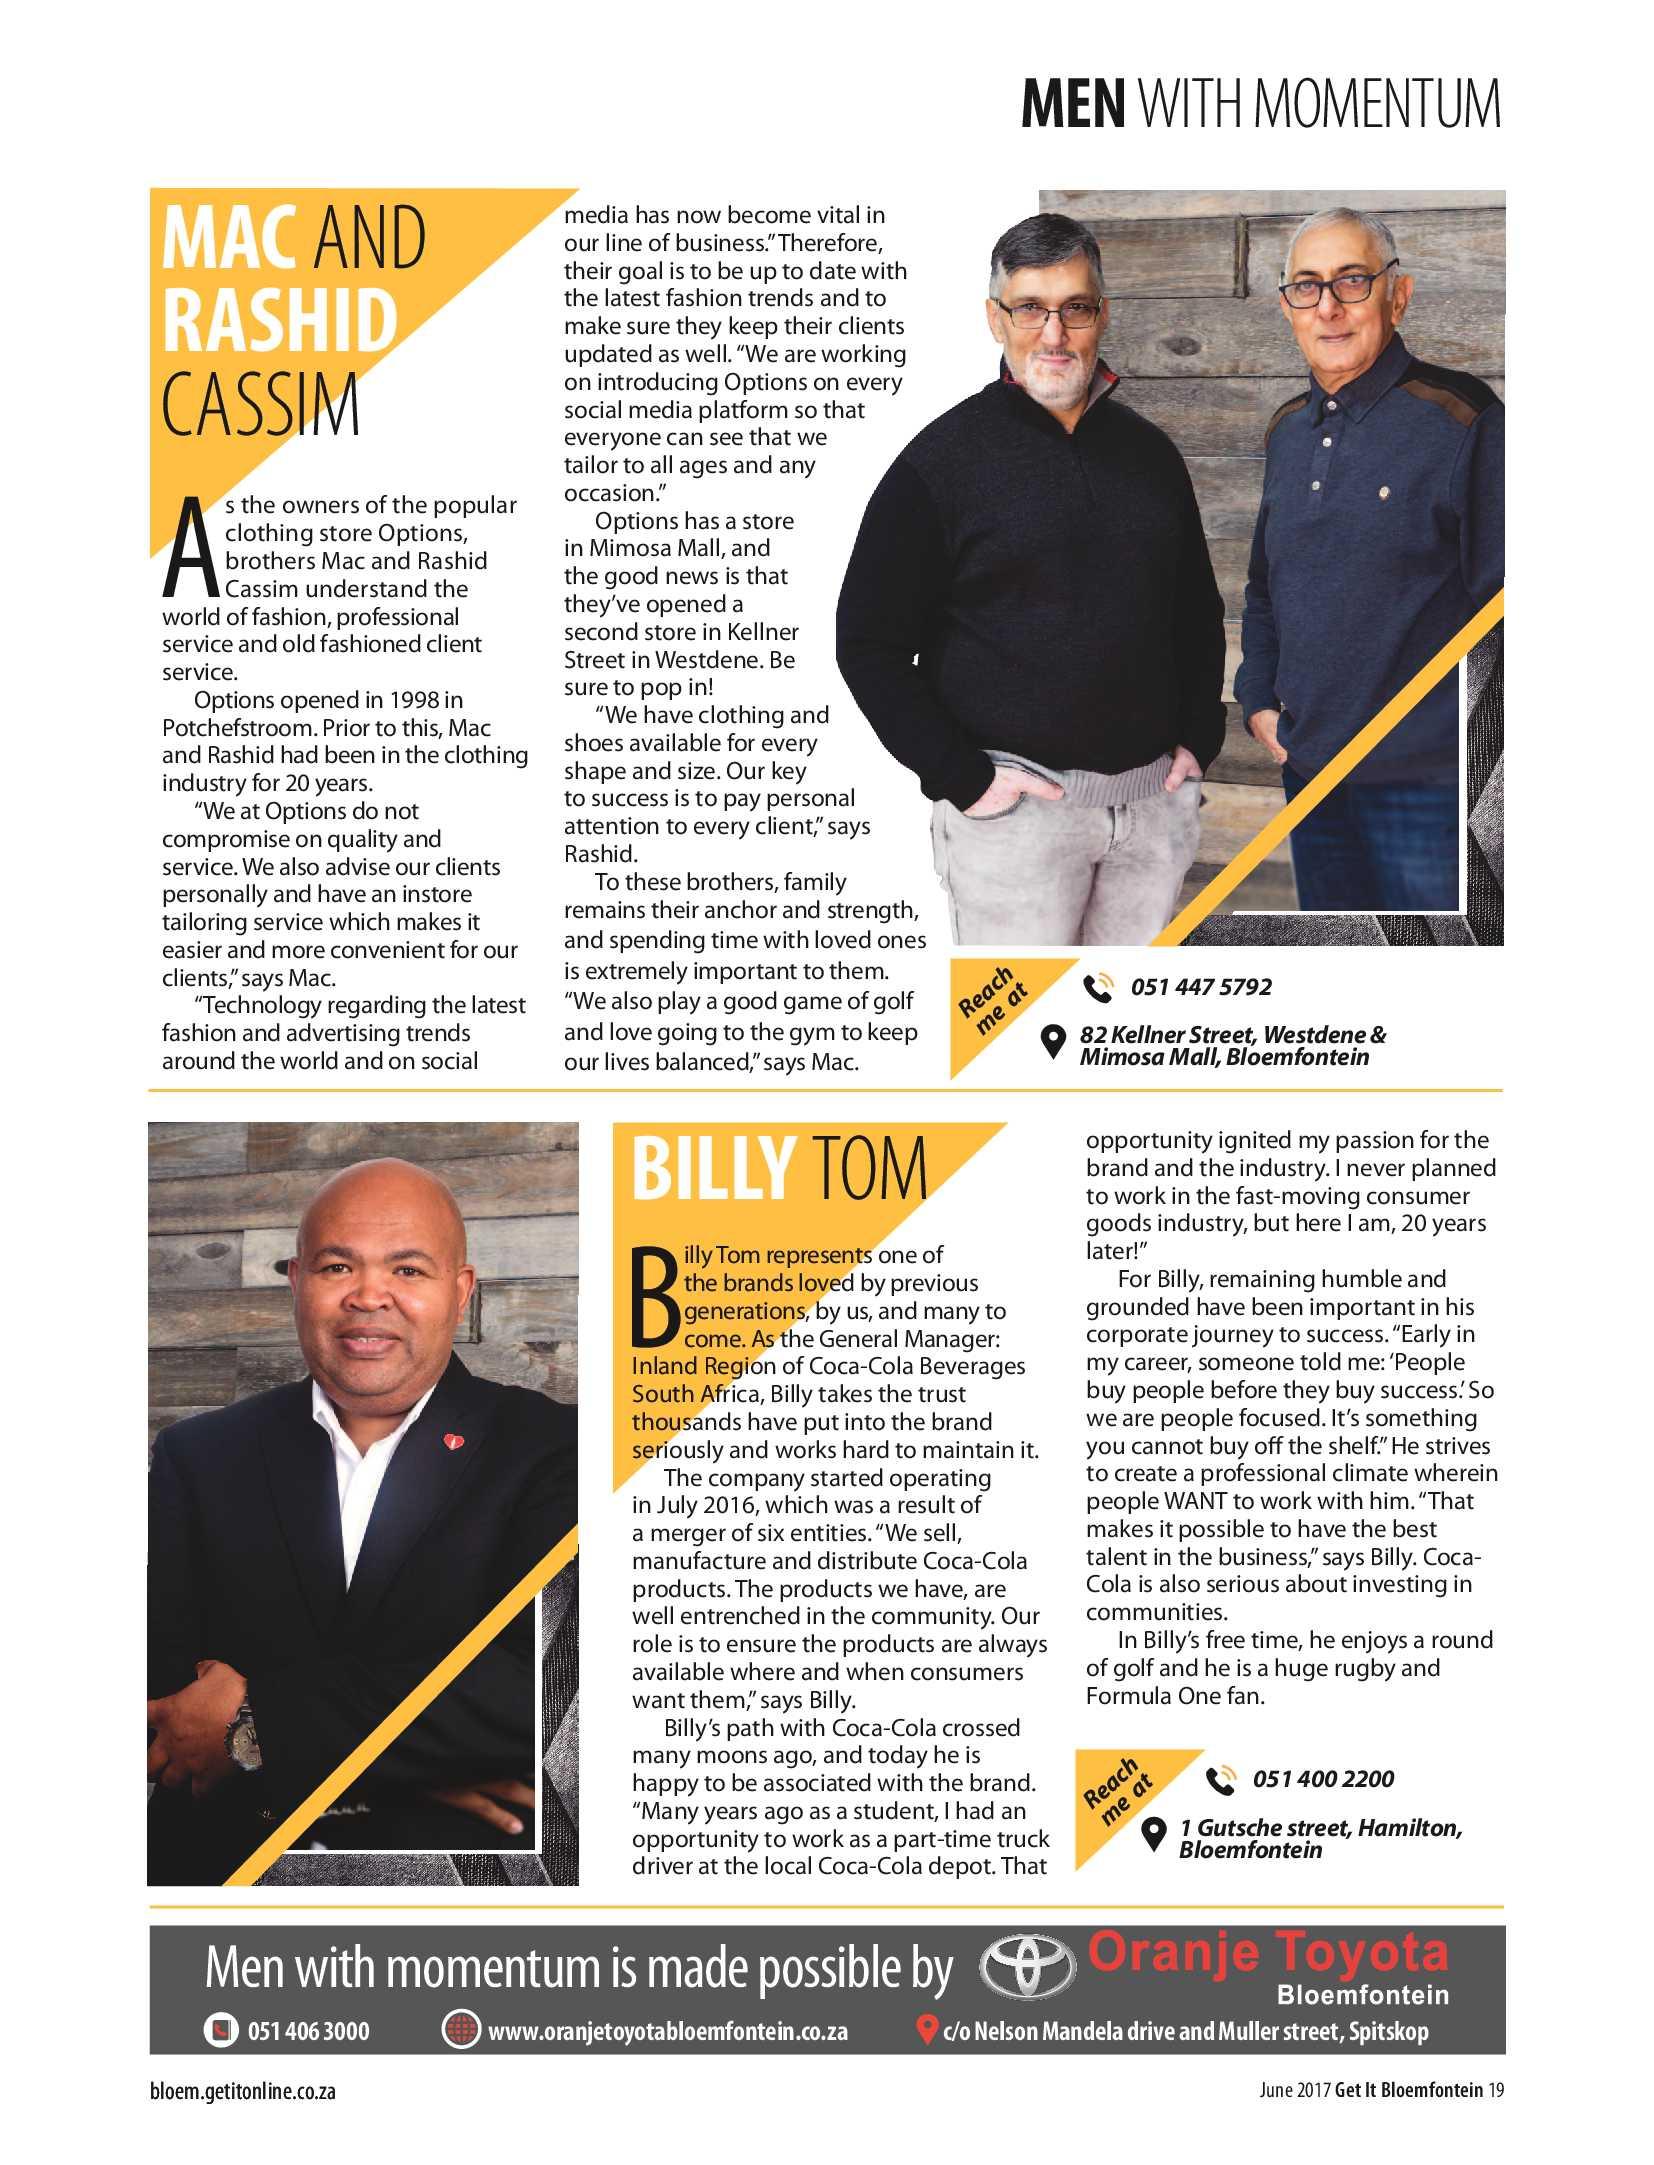 get-bloemfontein-june-2017-epapers-page-21